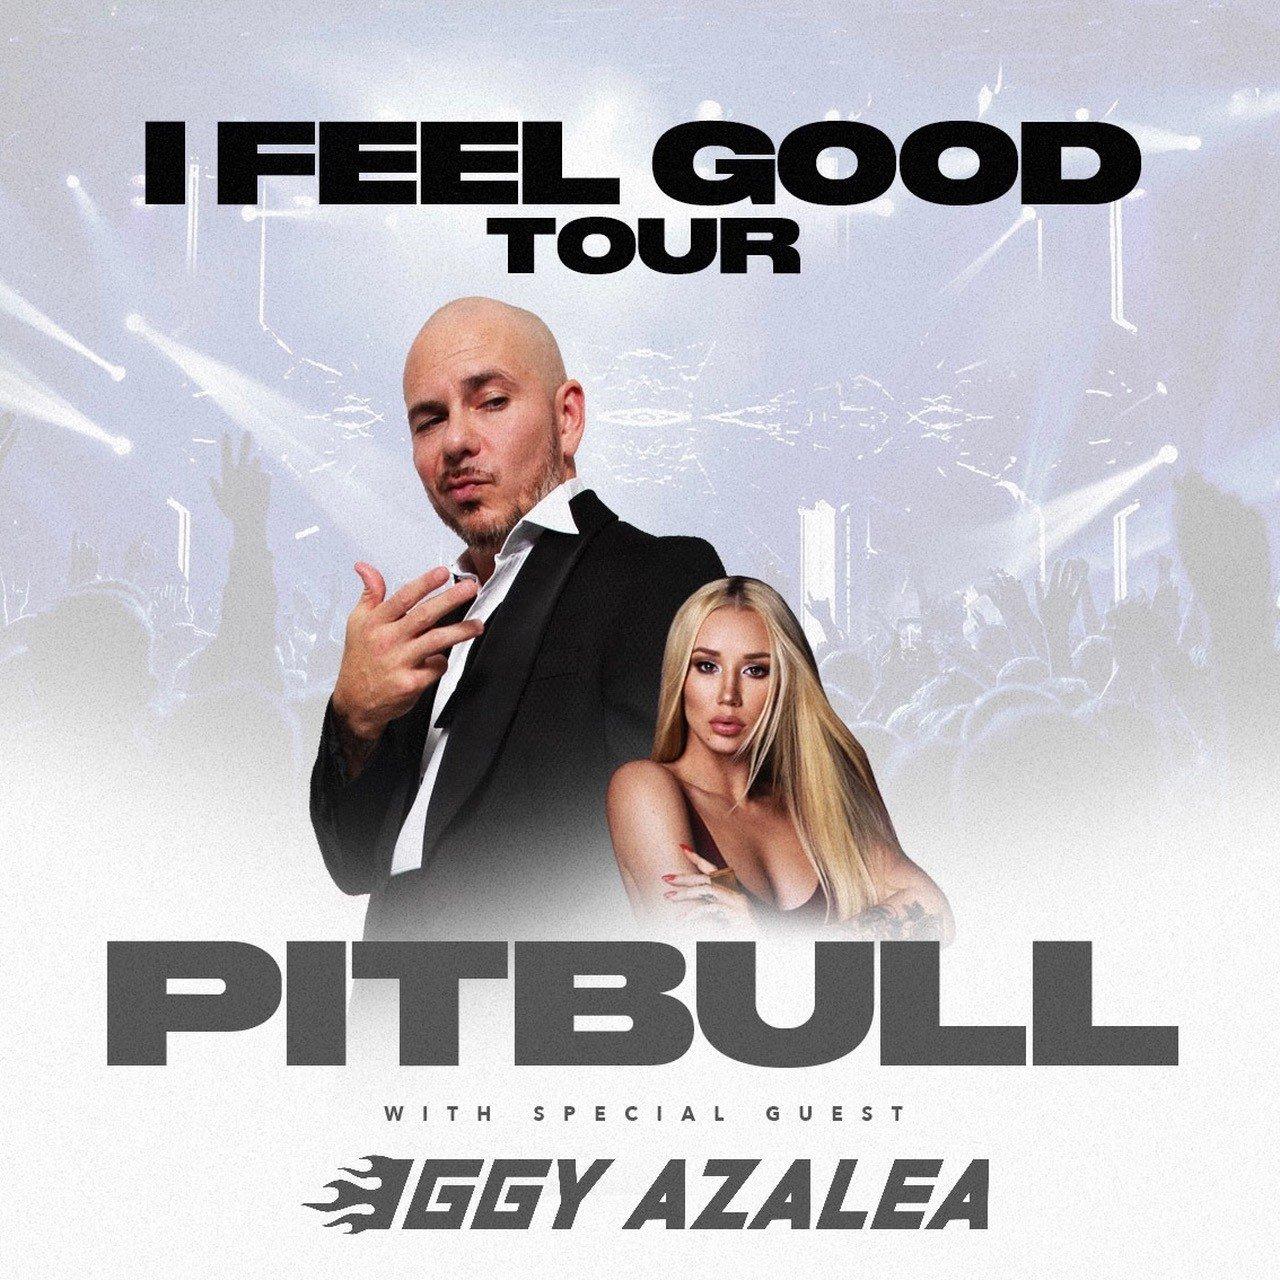 Pitbull iggy